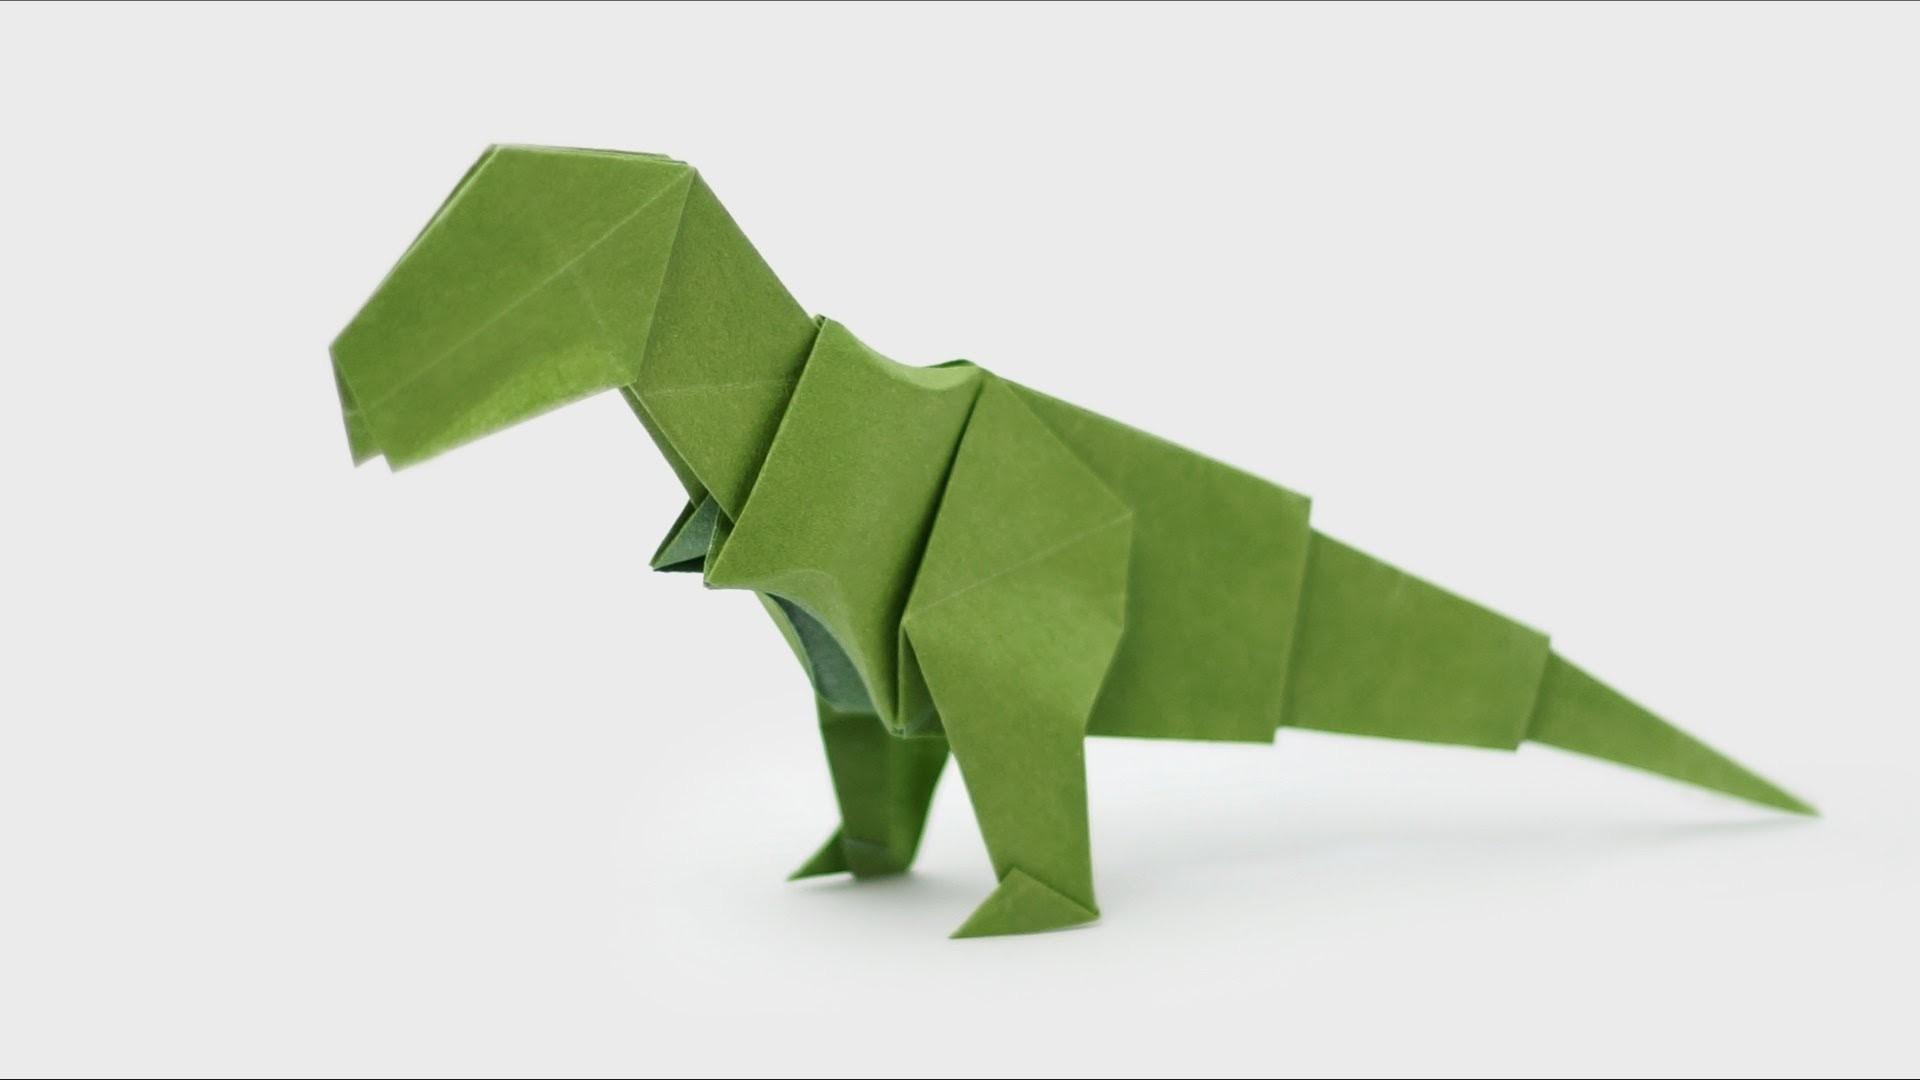 Origami Dinosaur - T-Rex - How to make an Origami Dinosaur ... - photo#12